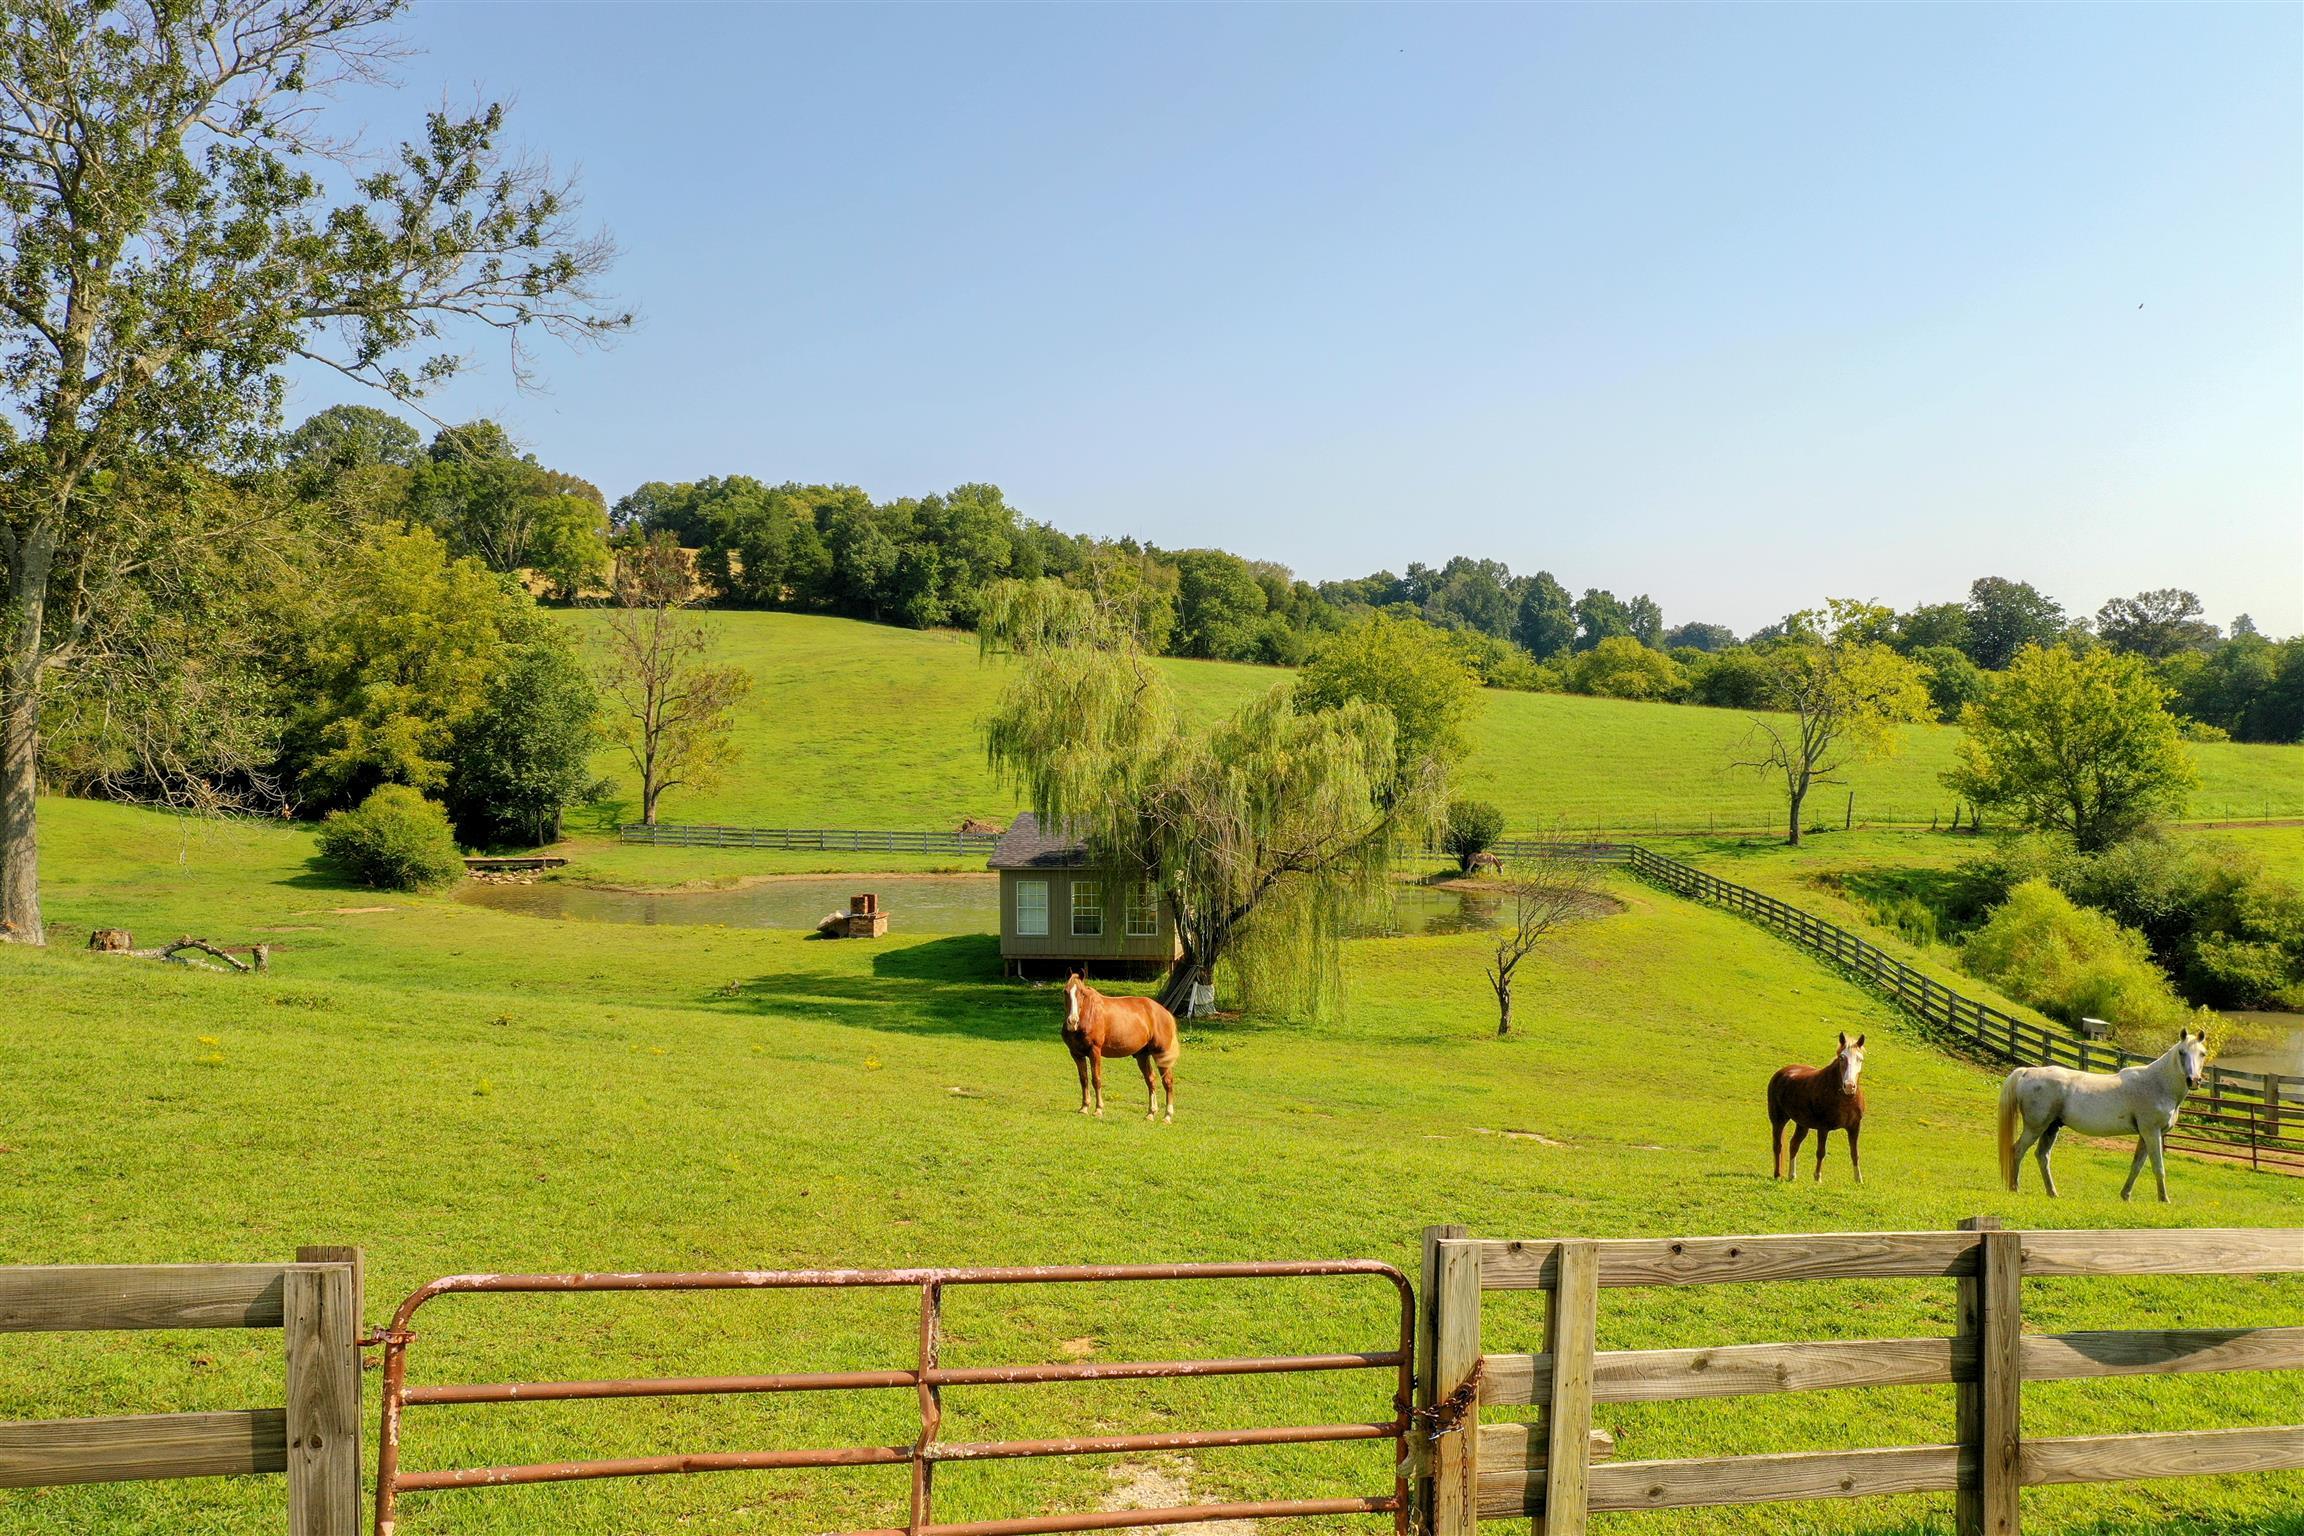 719 Waco Rd, Lynnville, TN 38472 - Lynnville, TN real estate listing